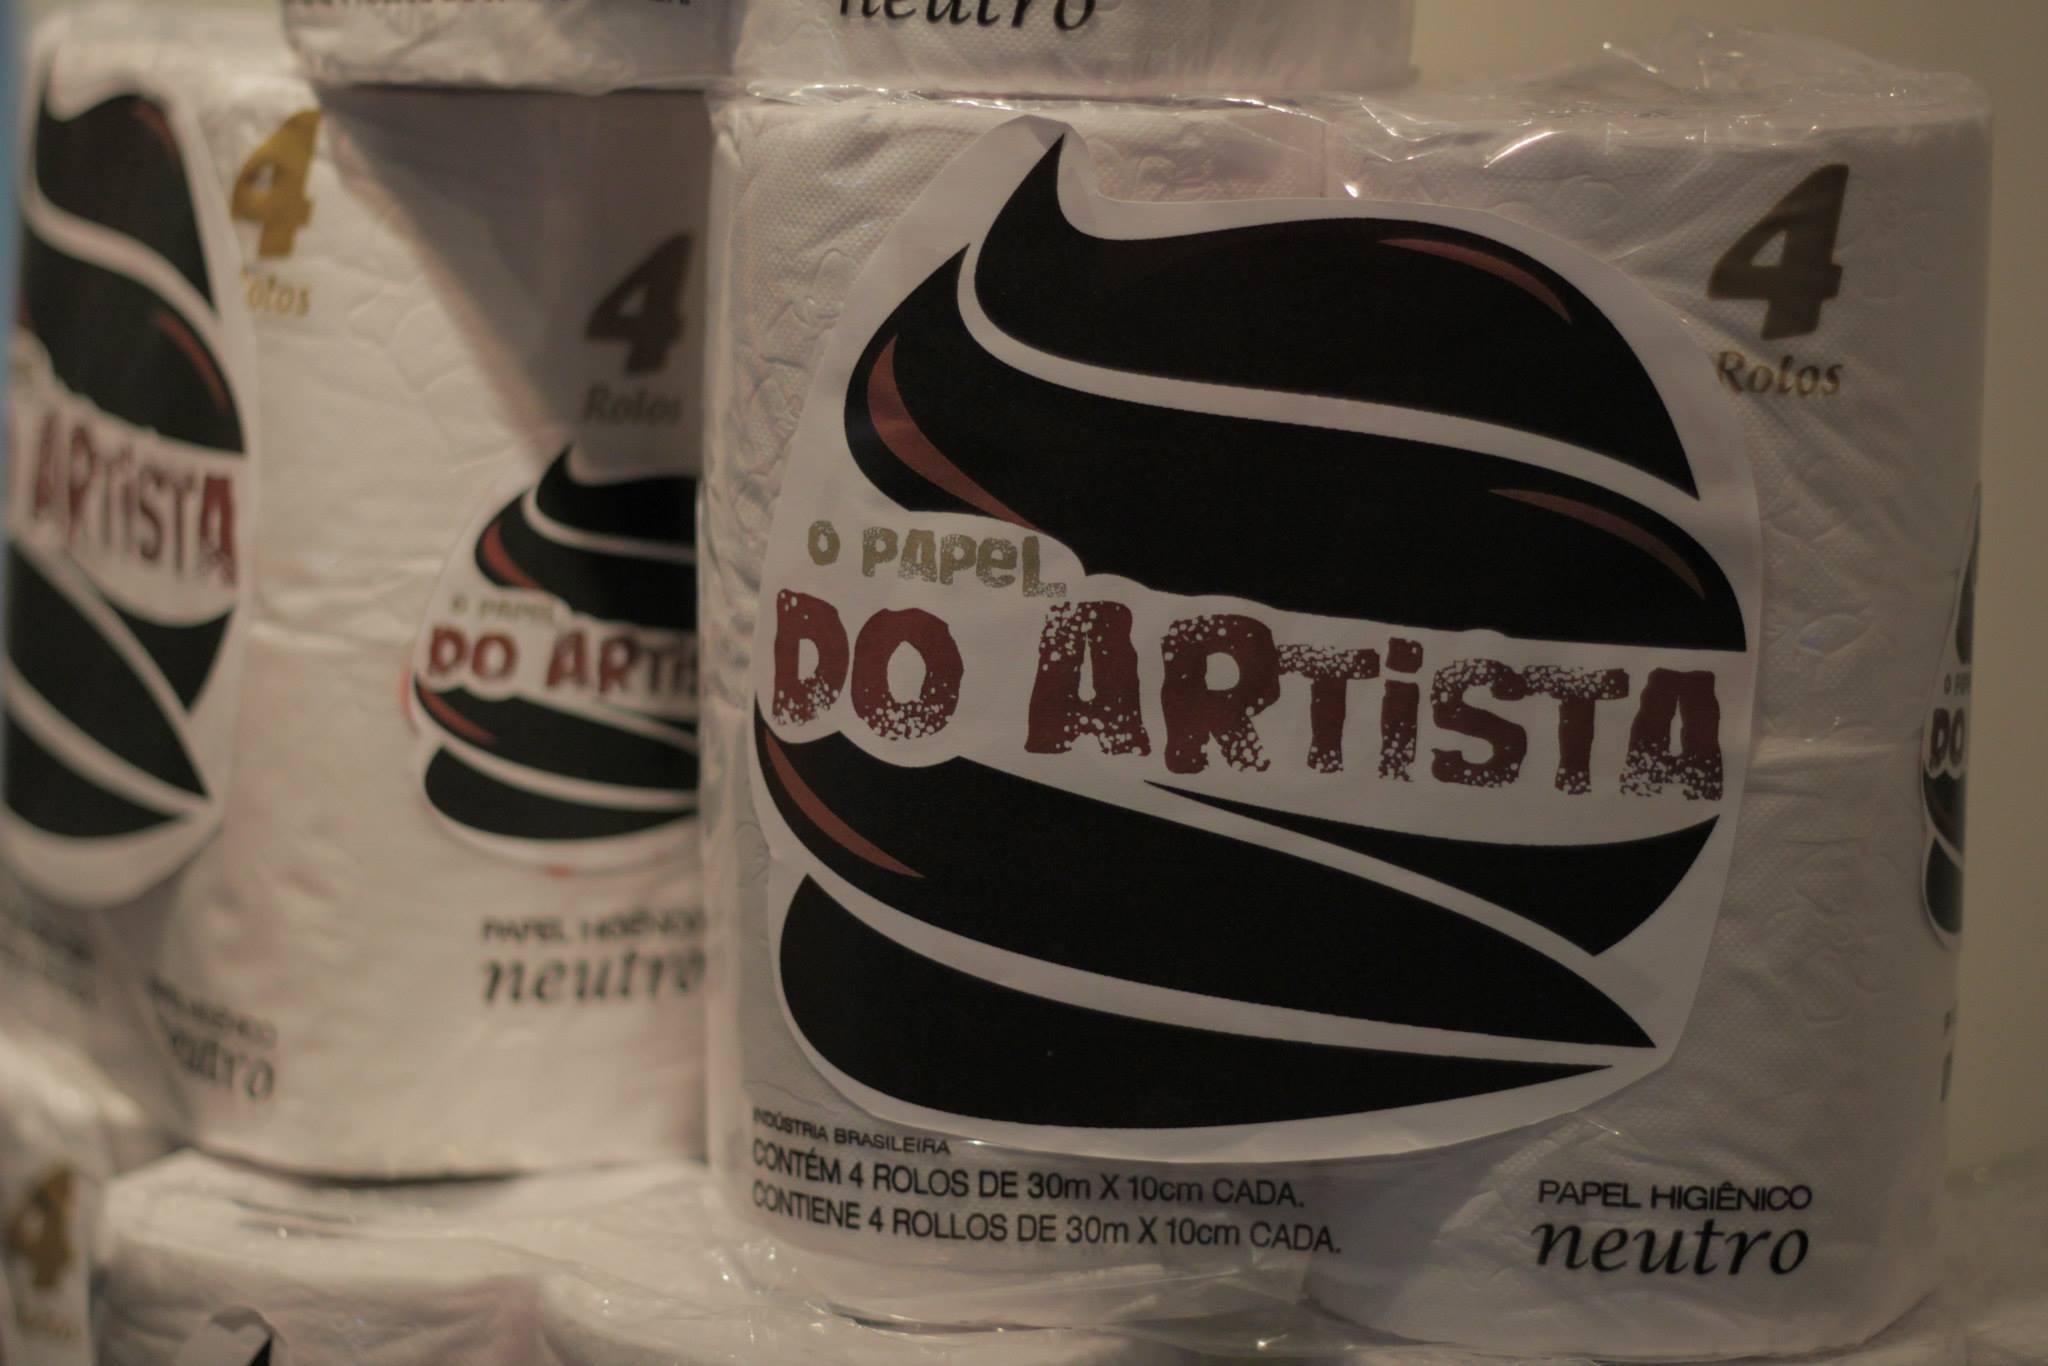 O PAPEL DO ARTISTA